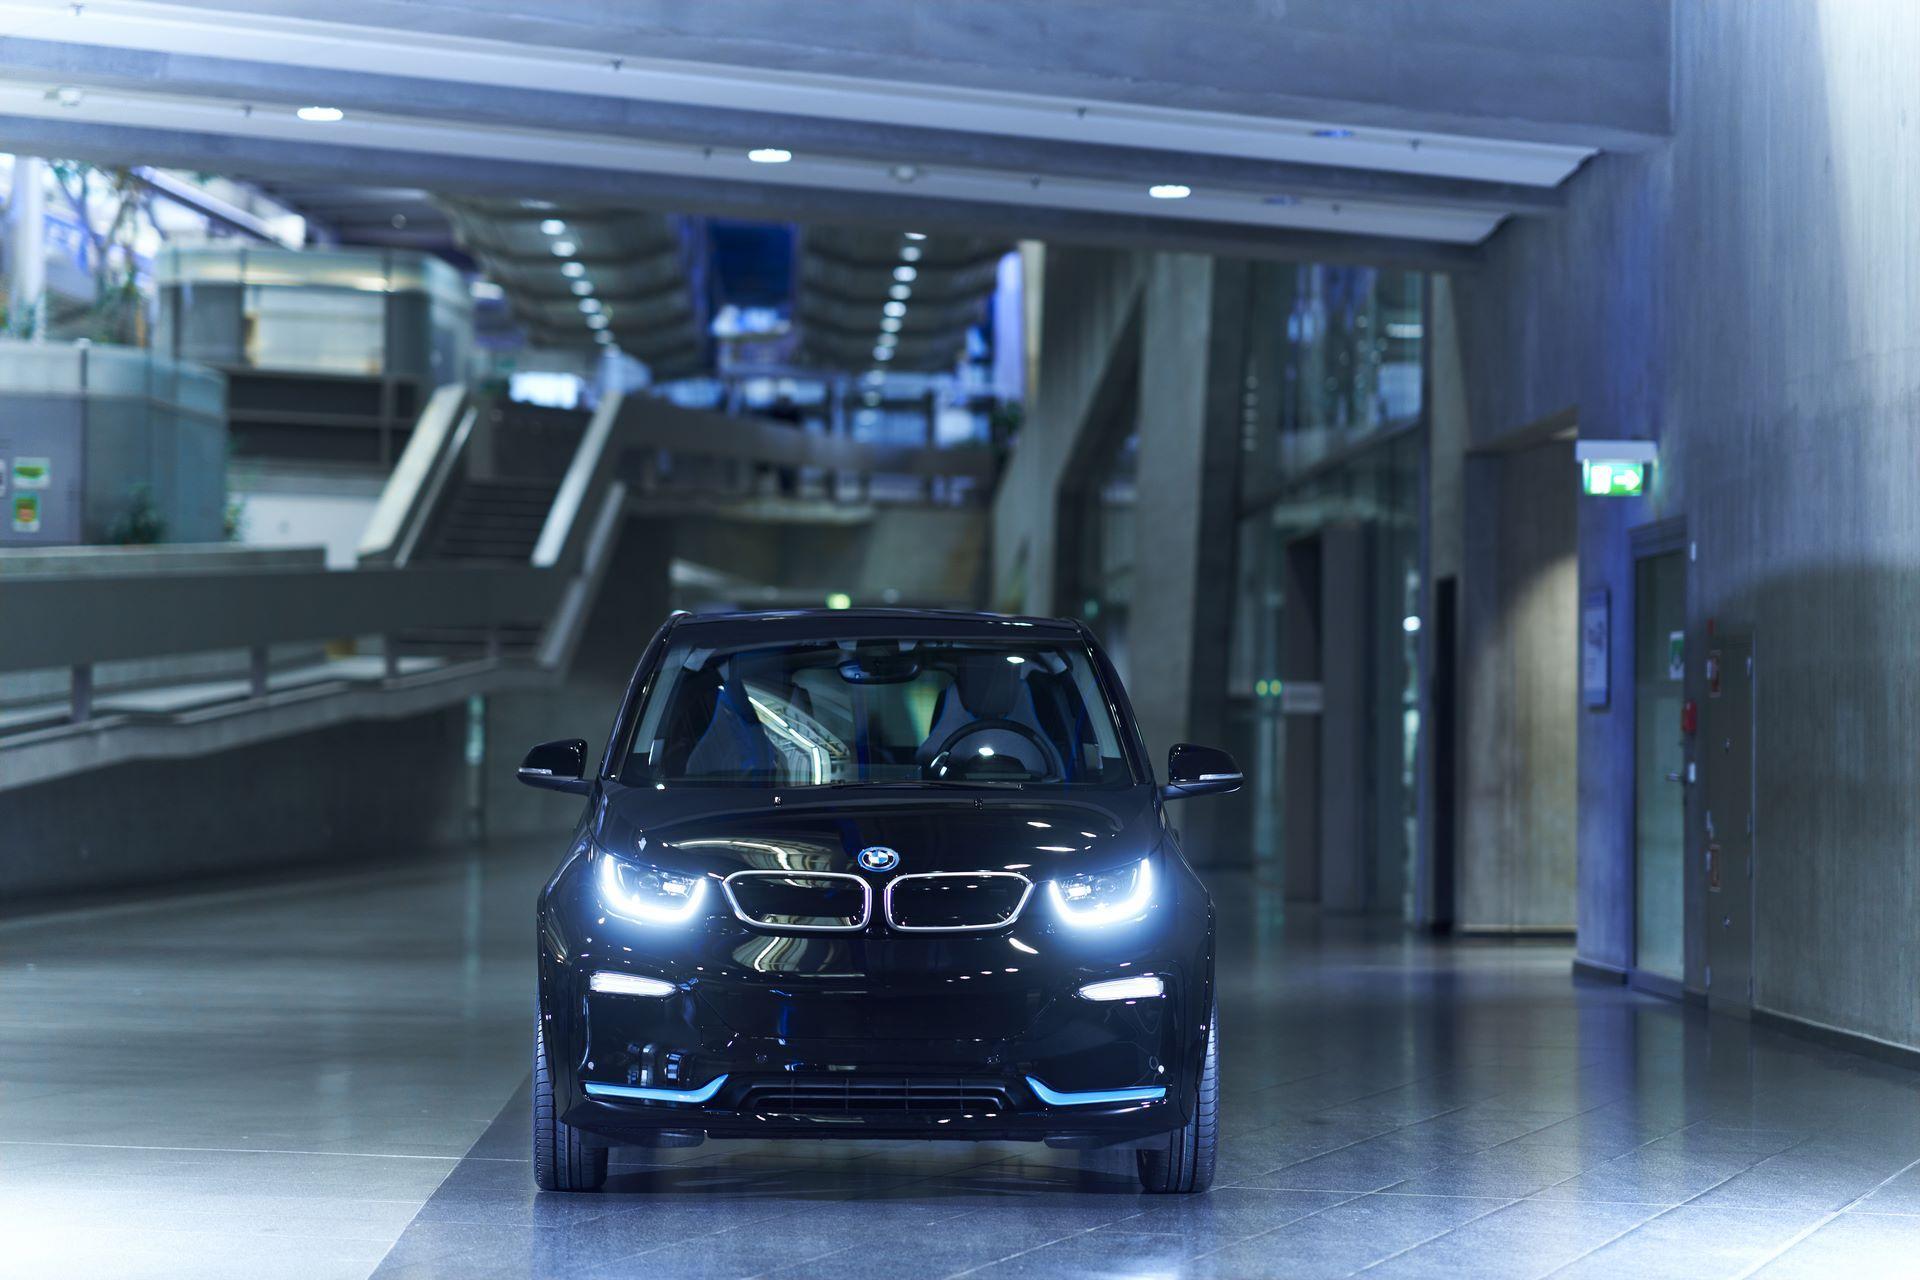 BMW-i8-plant-production-80